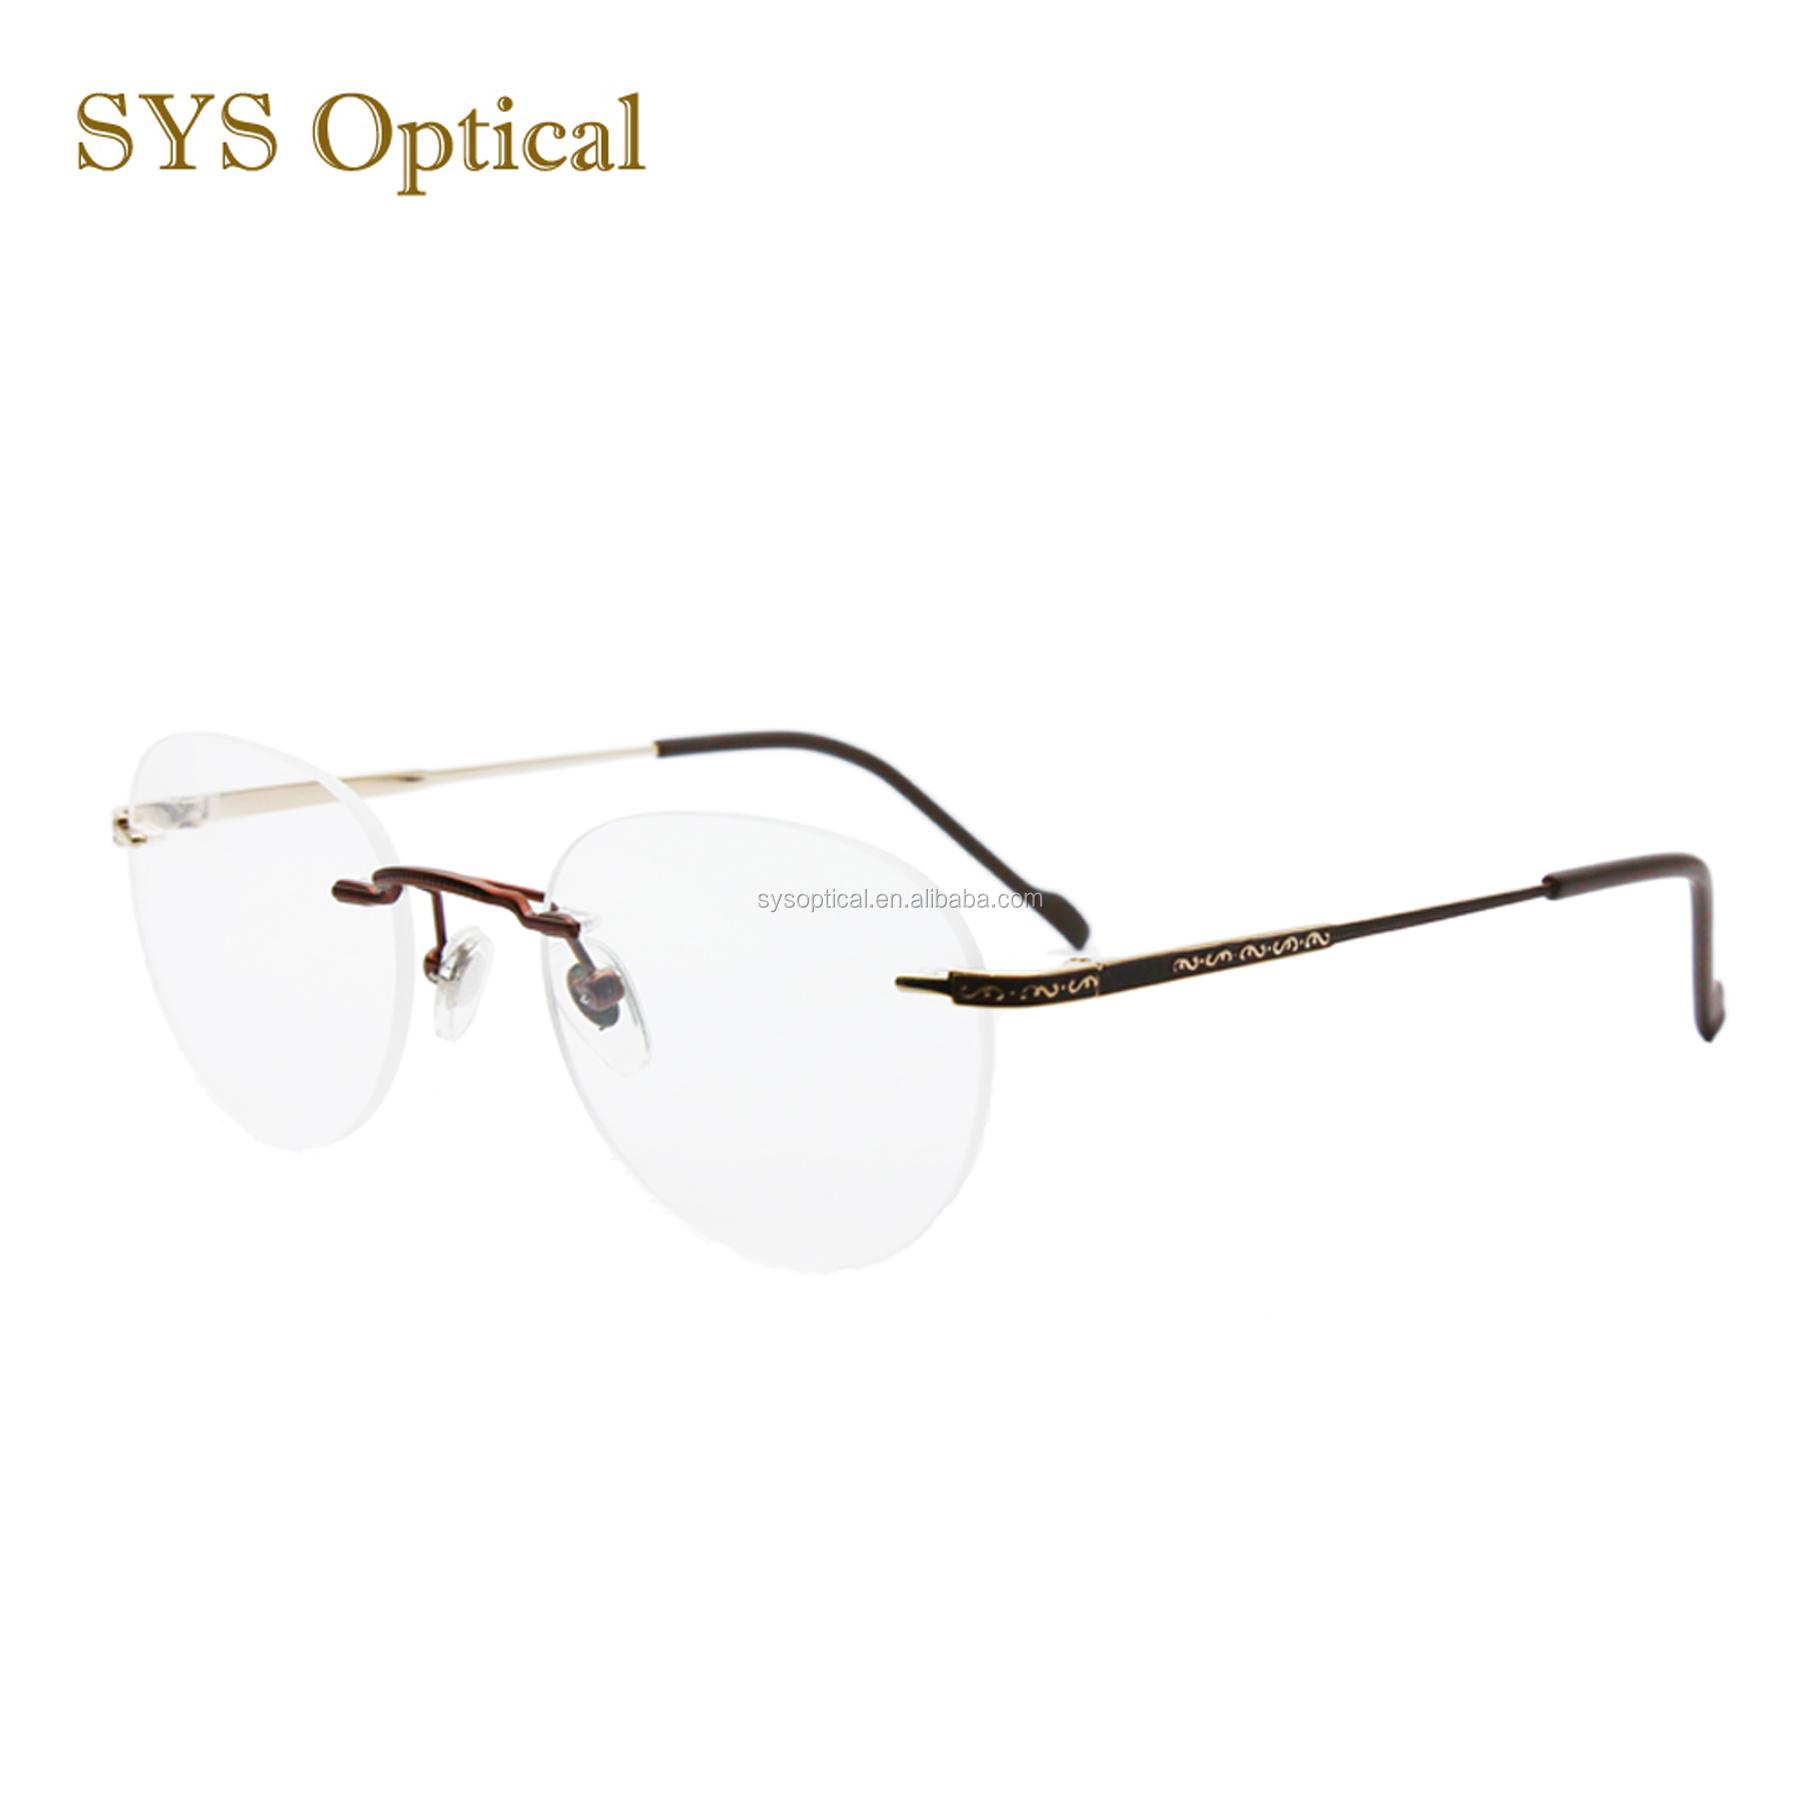 Most Popular Vintage Rimless Frame Glasses With Spring Leg - Buy Popular Eyeglasses  Frames,Eye Glasses Frame,Fancy Eyeglass Frames Product on Alibaba.com